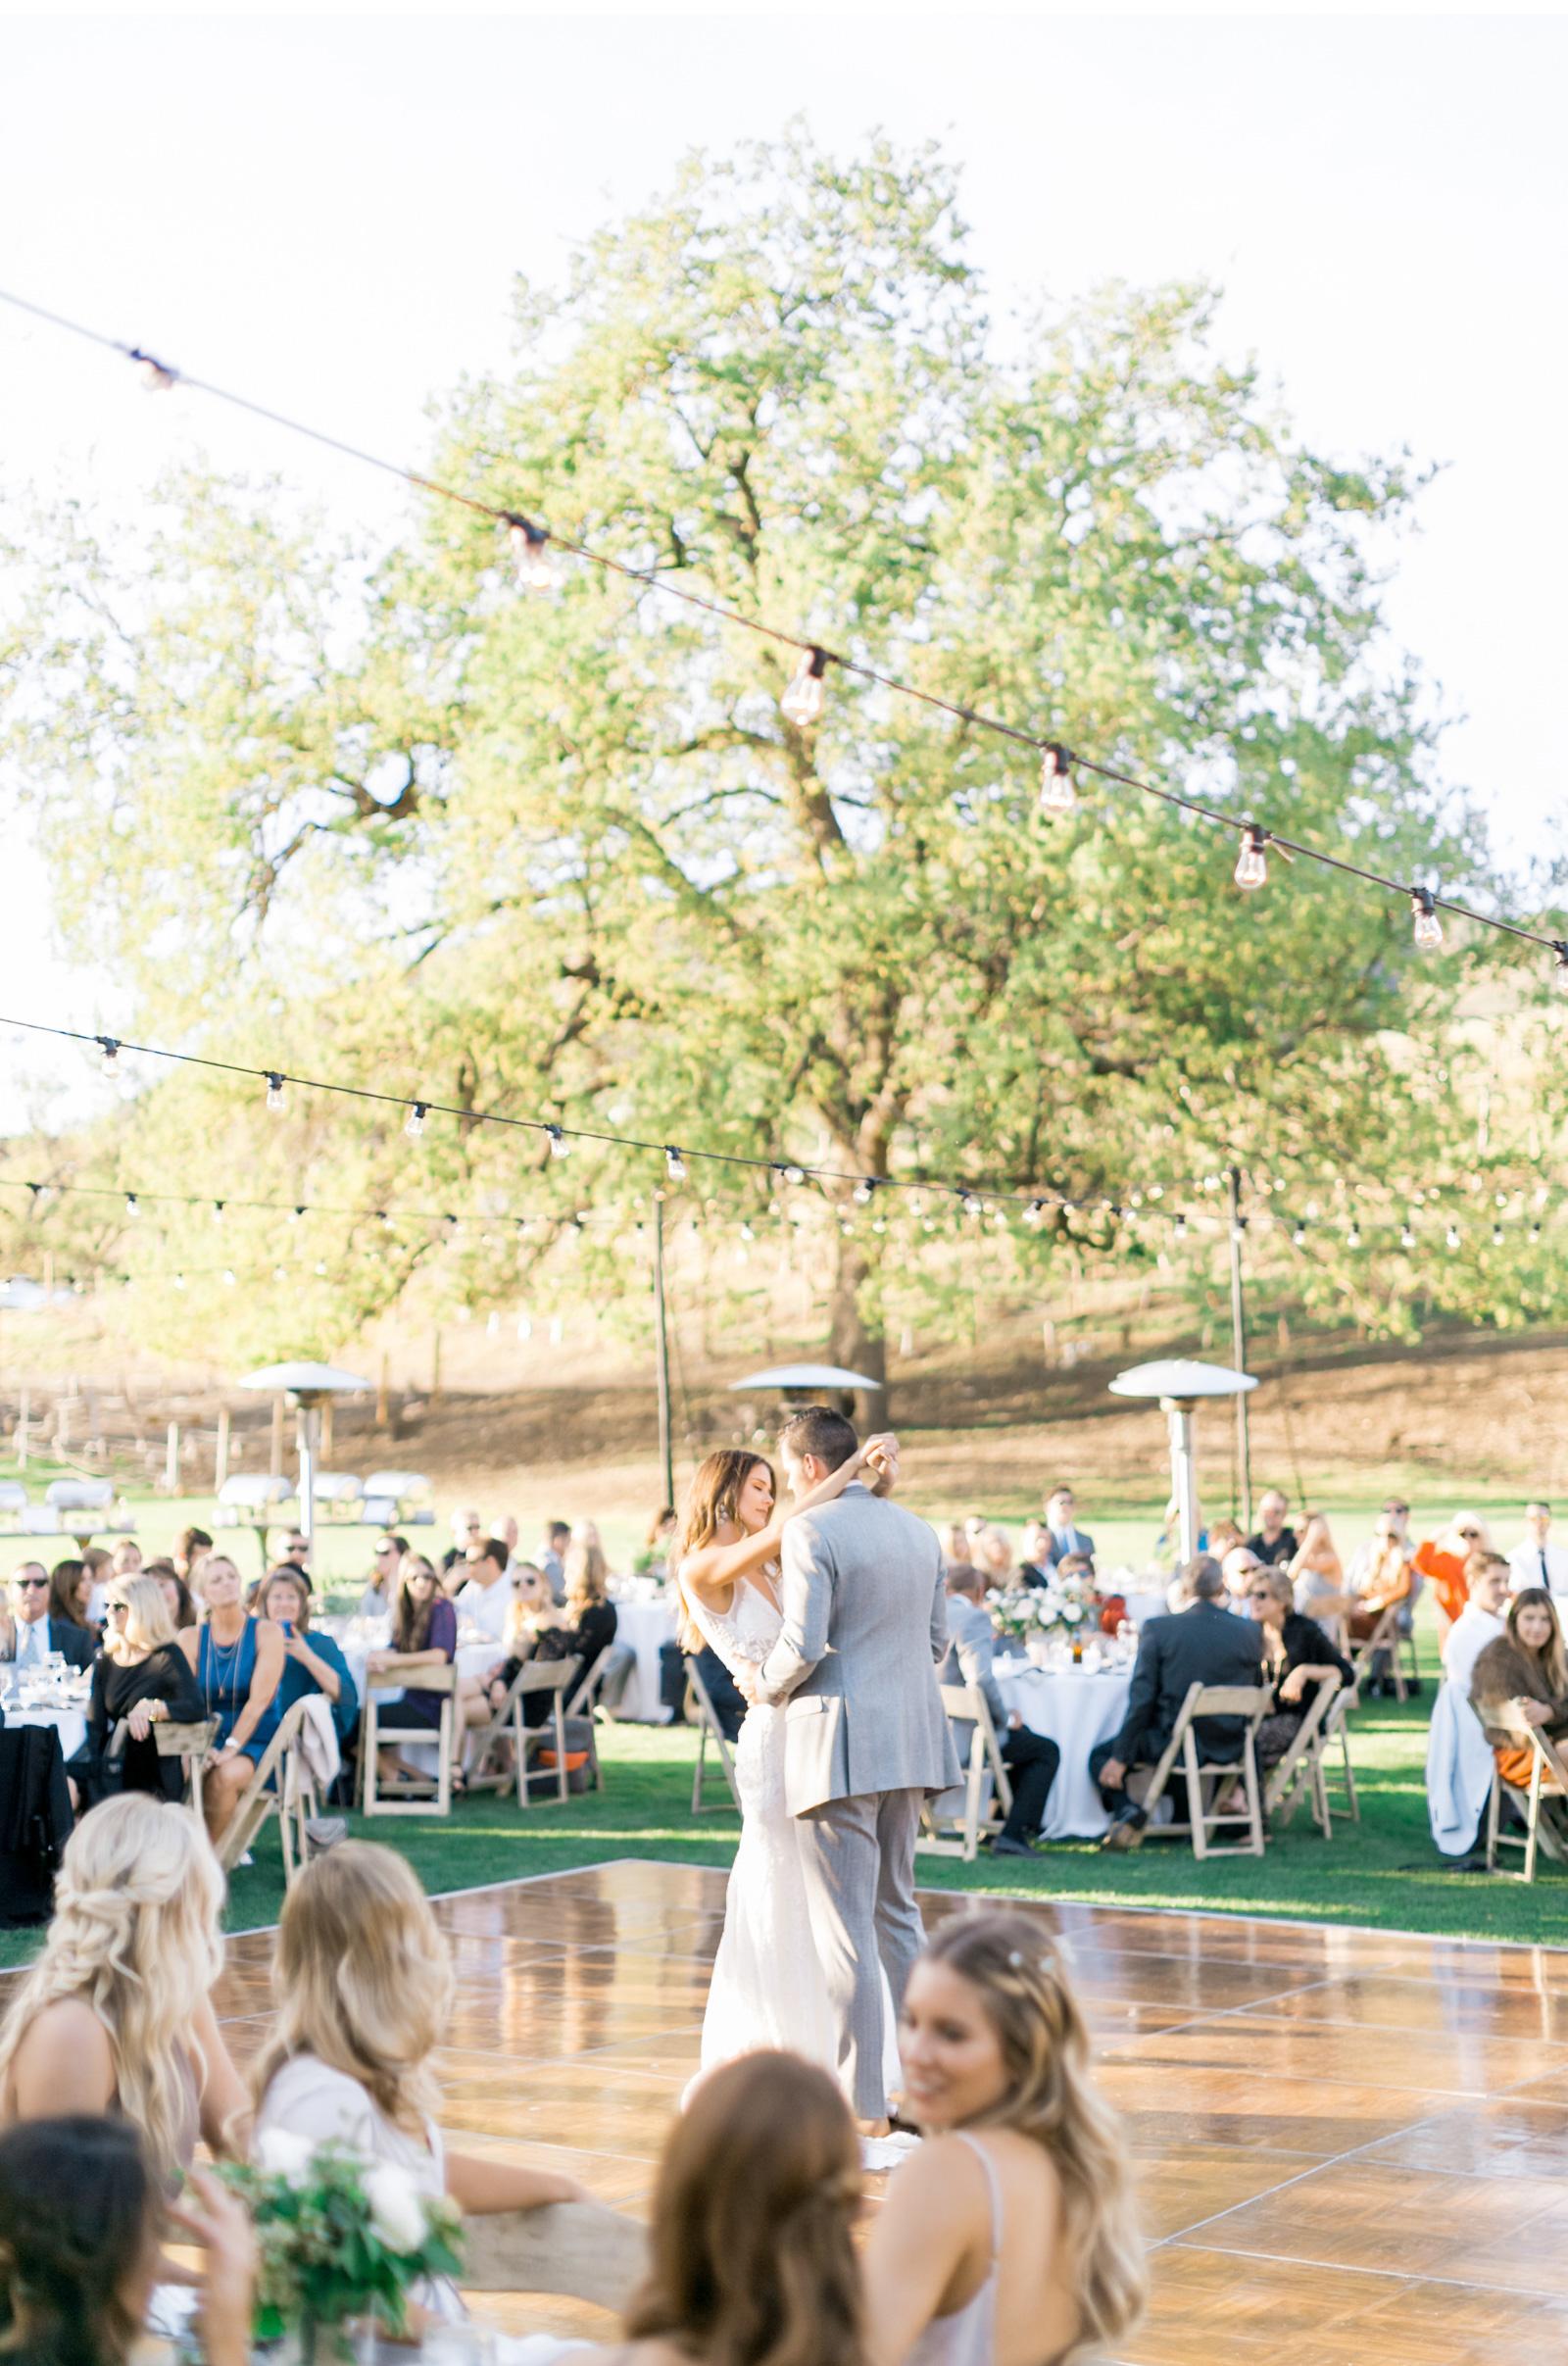 Triunfo-Creek-Malibu-Wedding-Natalie-Schutt-Photography-Couture-Events-Style-Me-Pretty_07.jpg